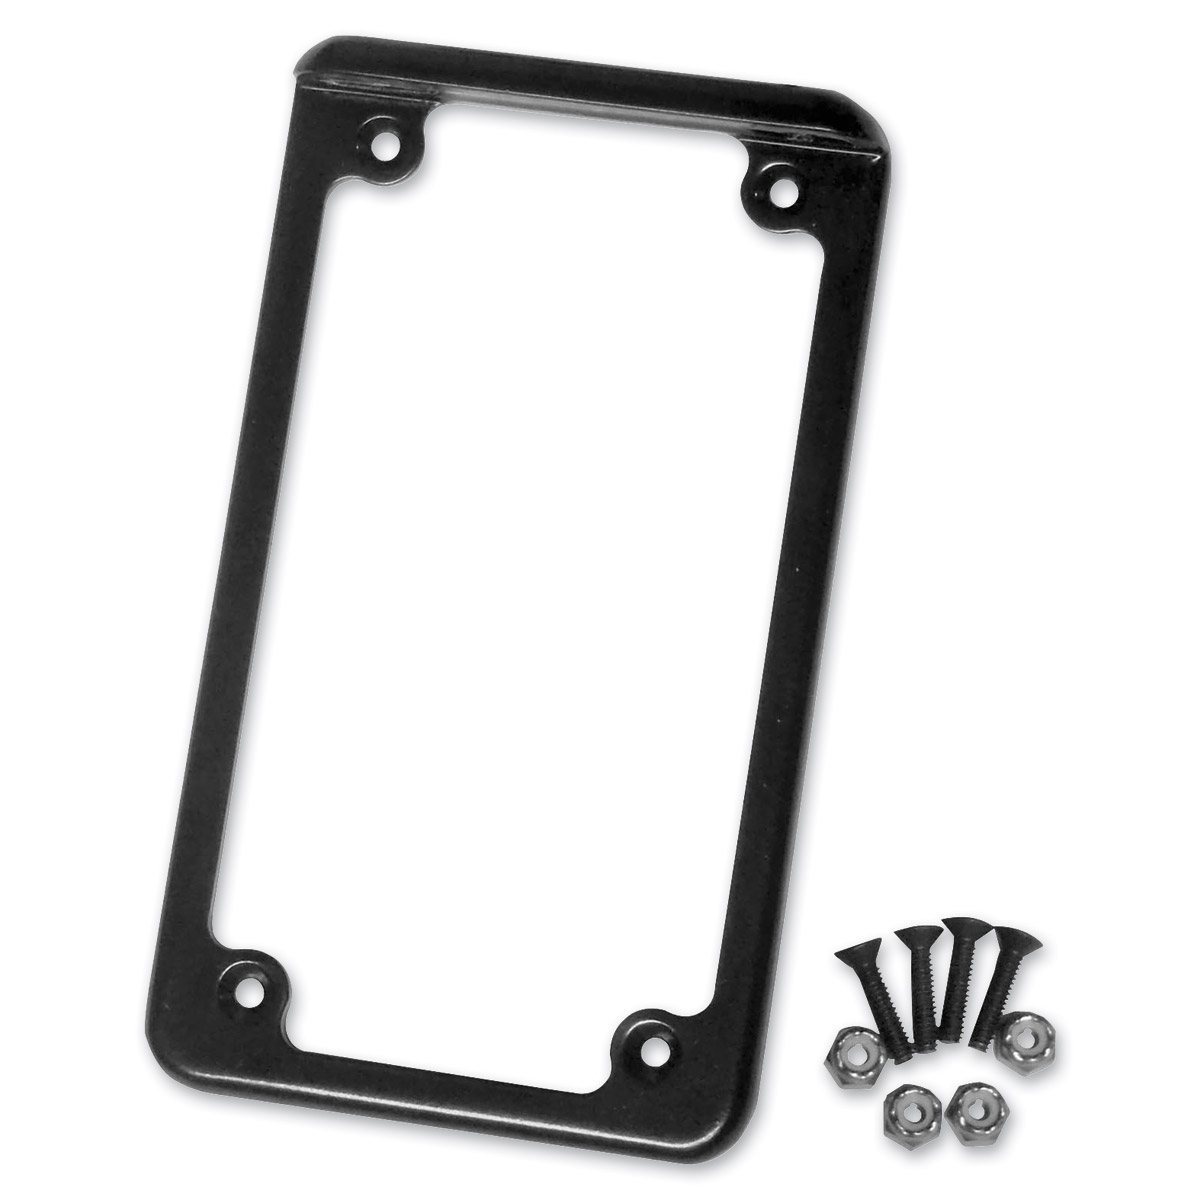 Radiantz Illuminator License Plate Frame